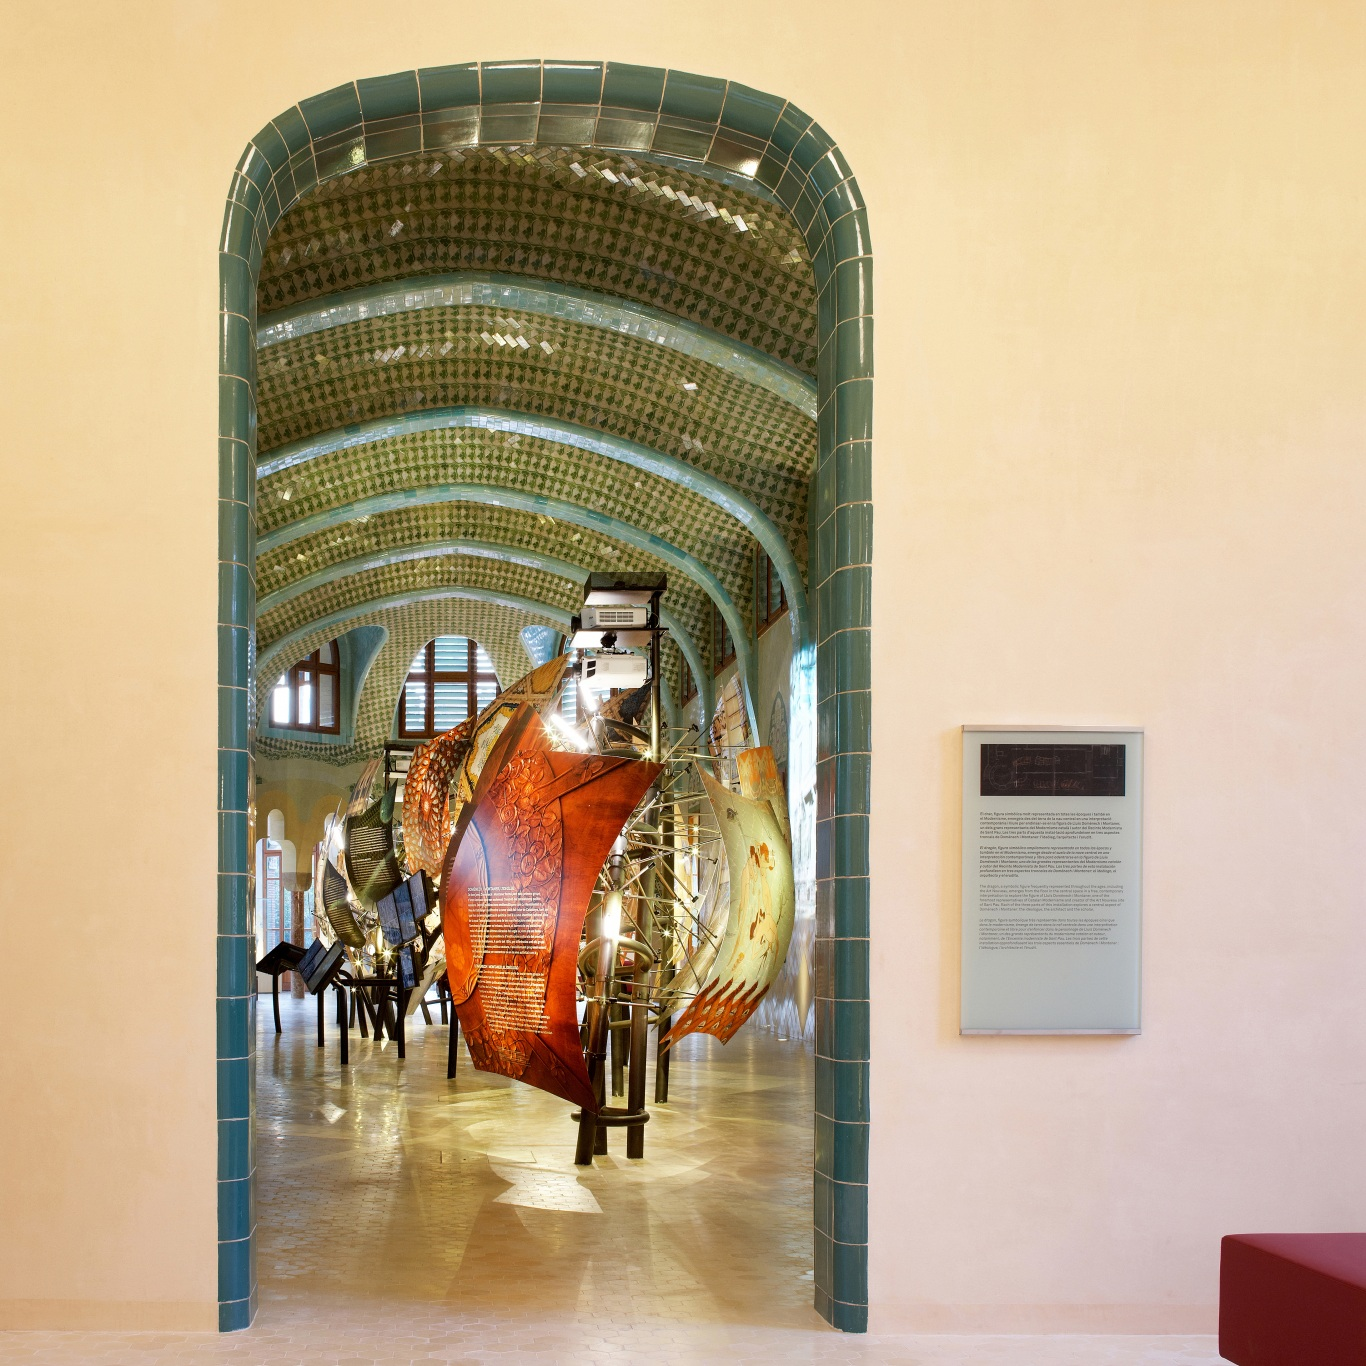 Hospital of the Santa Creu i Sant Pau. Access to the dragon exhibition. Dragon\'s structure illuminated over the pavilion\'s ceramic interior.